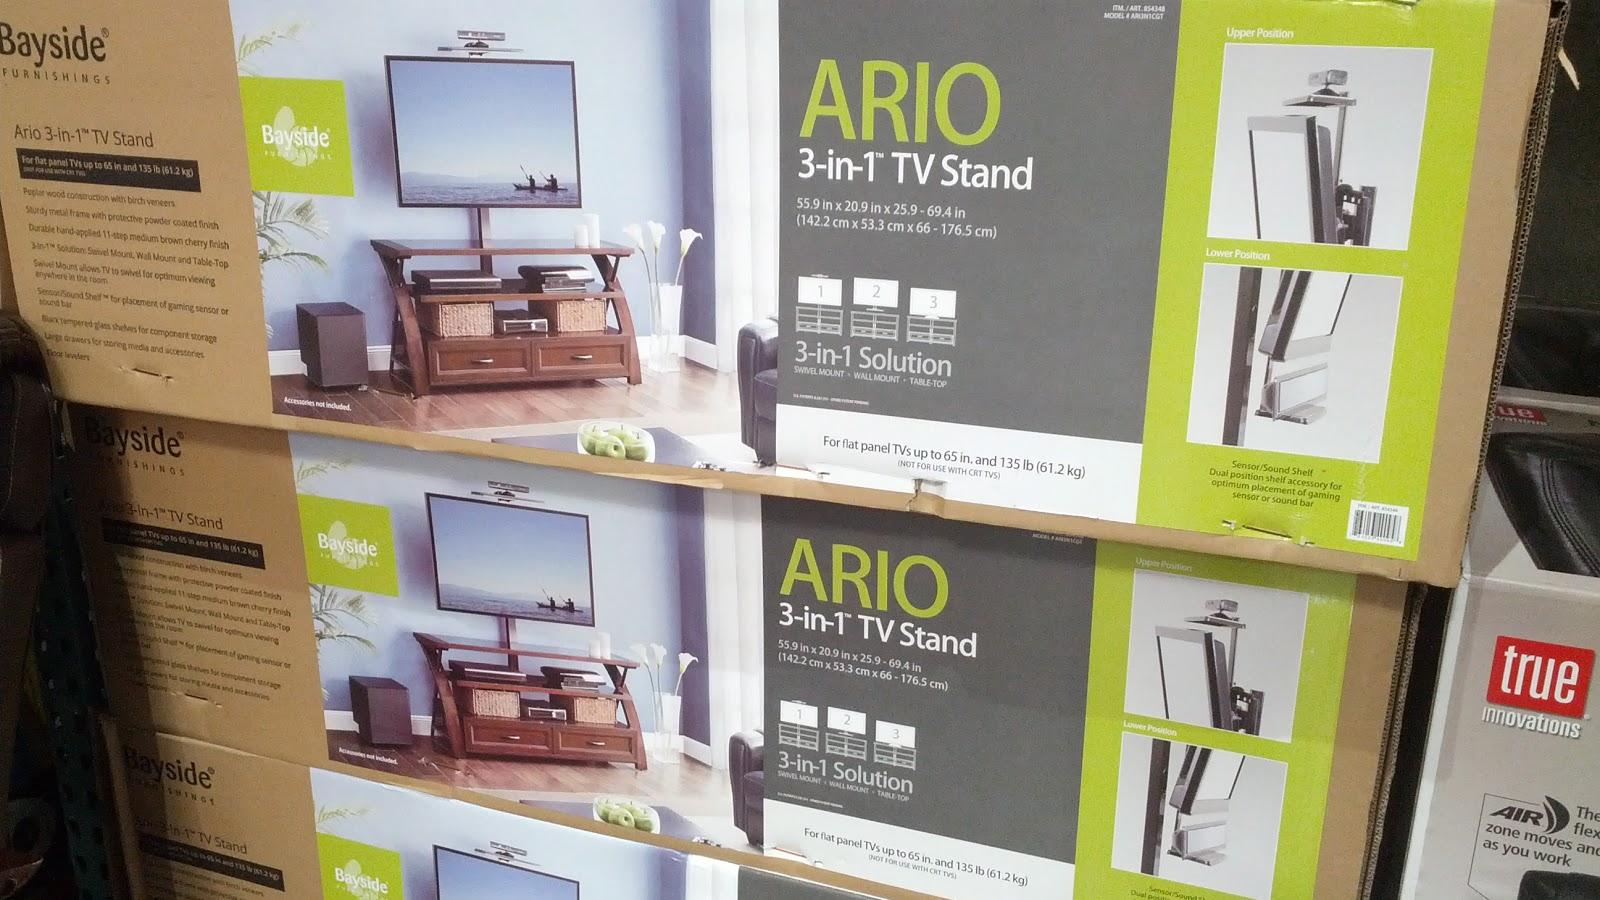 Bayside Furnishings Ario 3 In 1 Tv Stand Costco Weekender